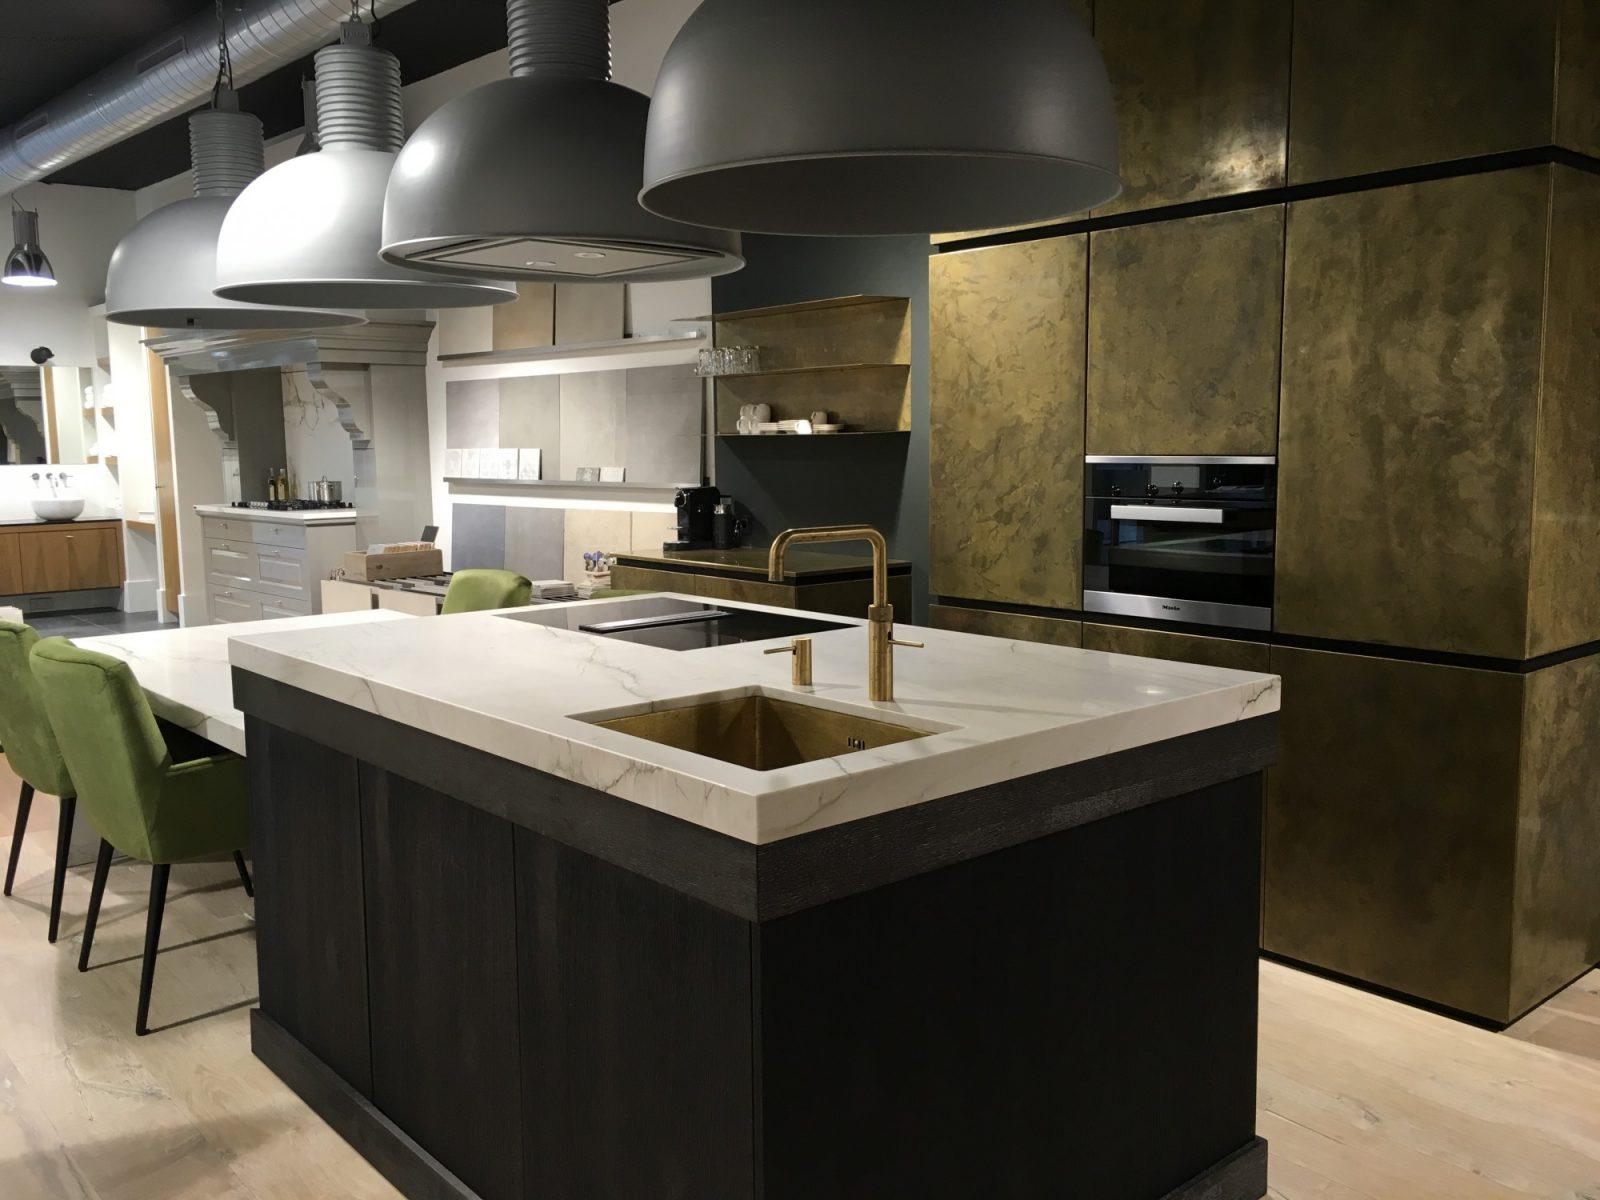 Jacob showroom keuken model venezia jacob - Model keuken ...